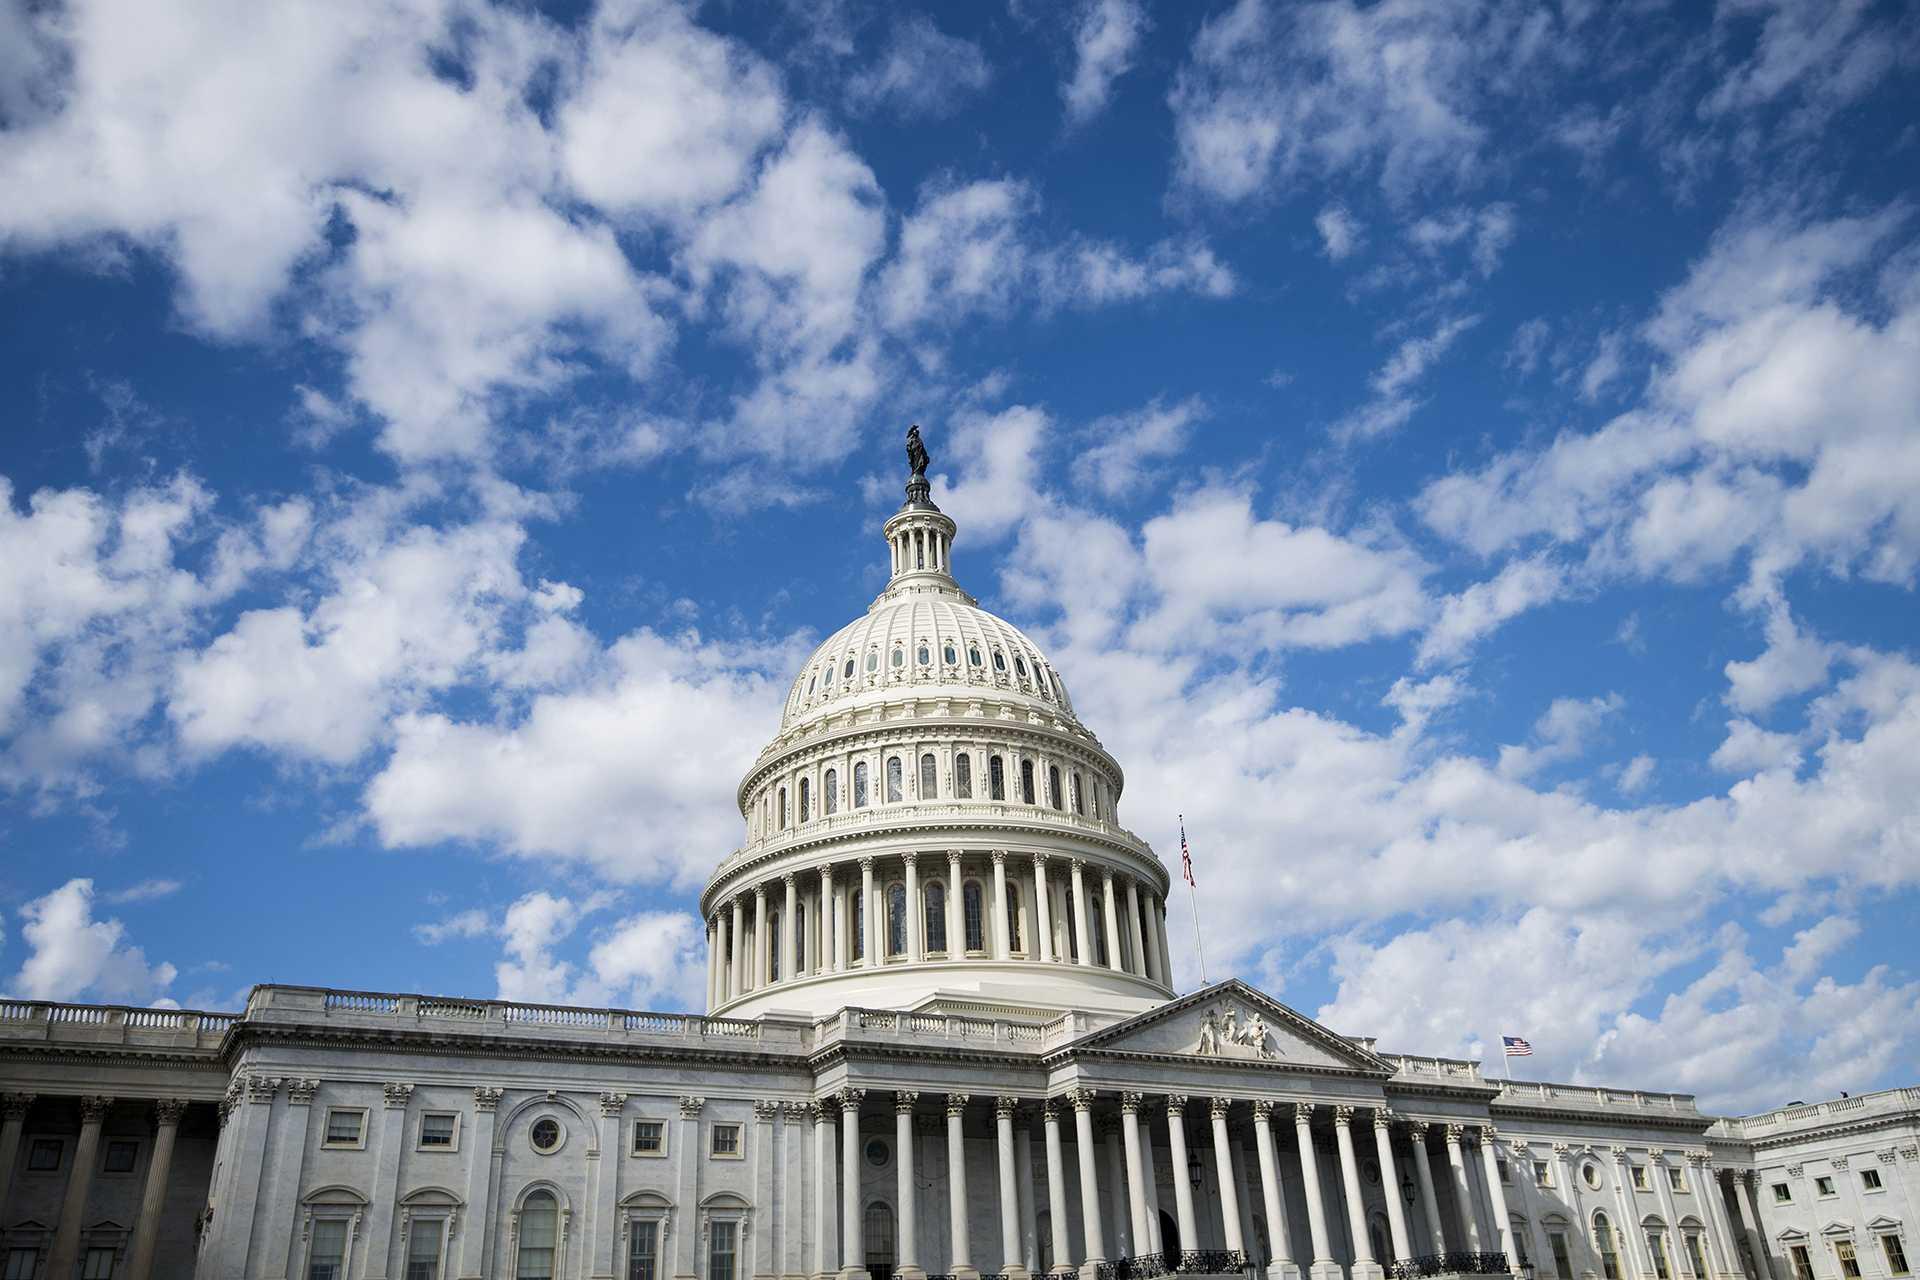 The U.S. Capitol building on Wednesday, Oct. 25, 2017. (Bill Clark/Congressional Quarterly/Newscom/Zuma Press/TNS)